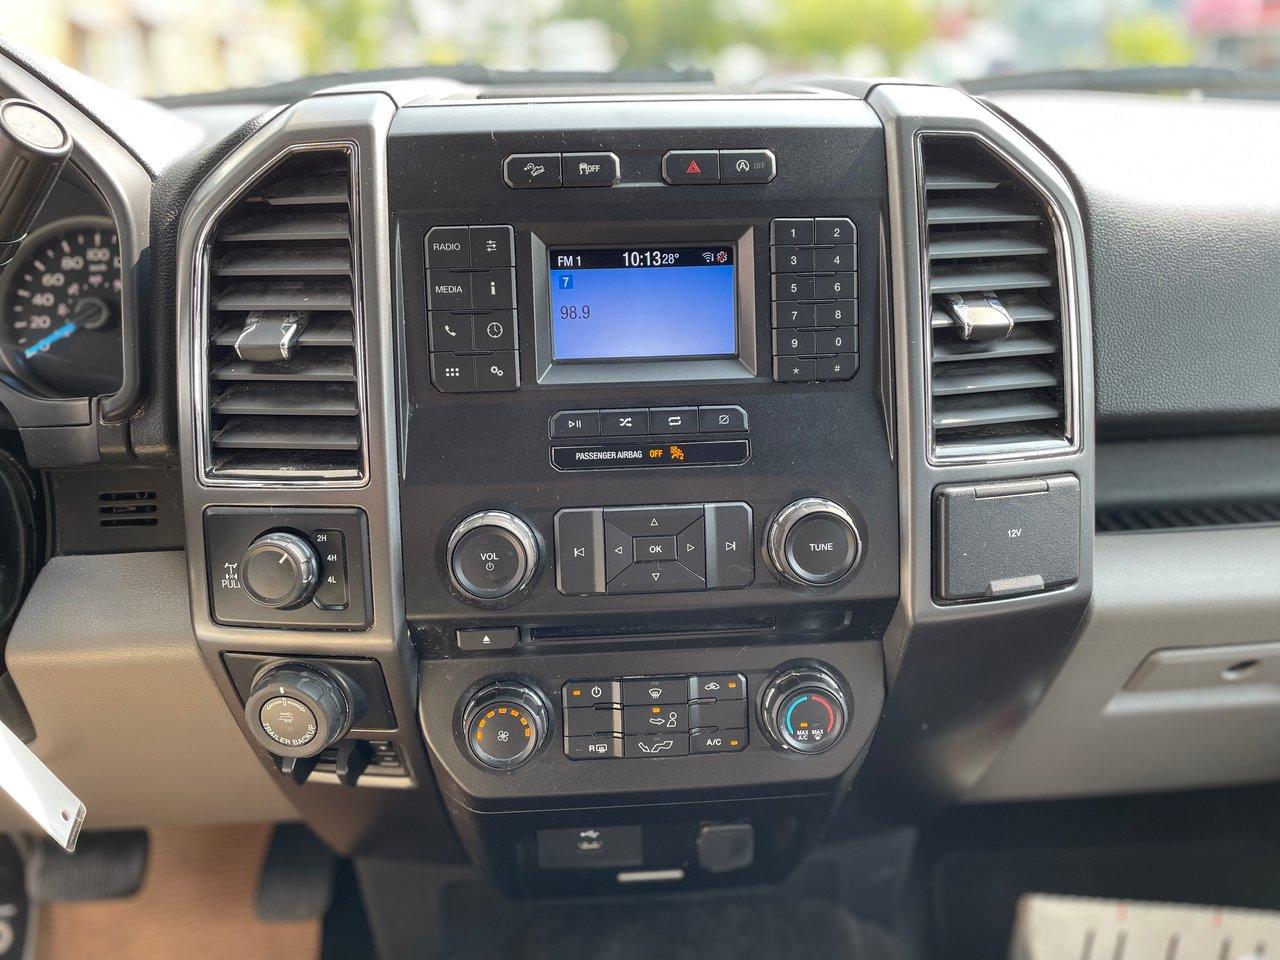 2018 Ford F-150 SuperCrew XLT 301A